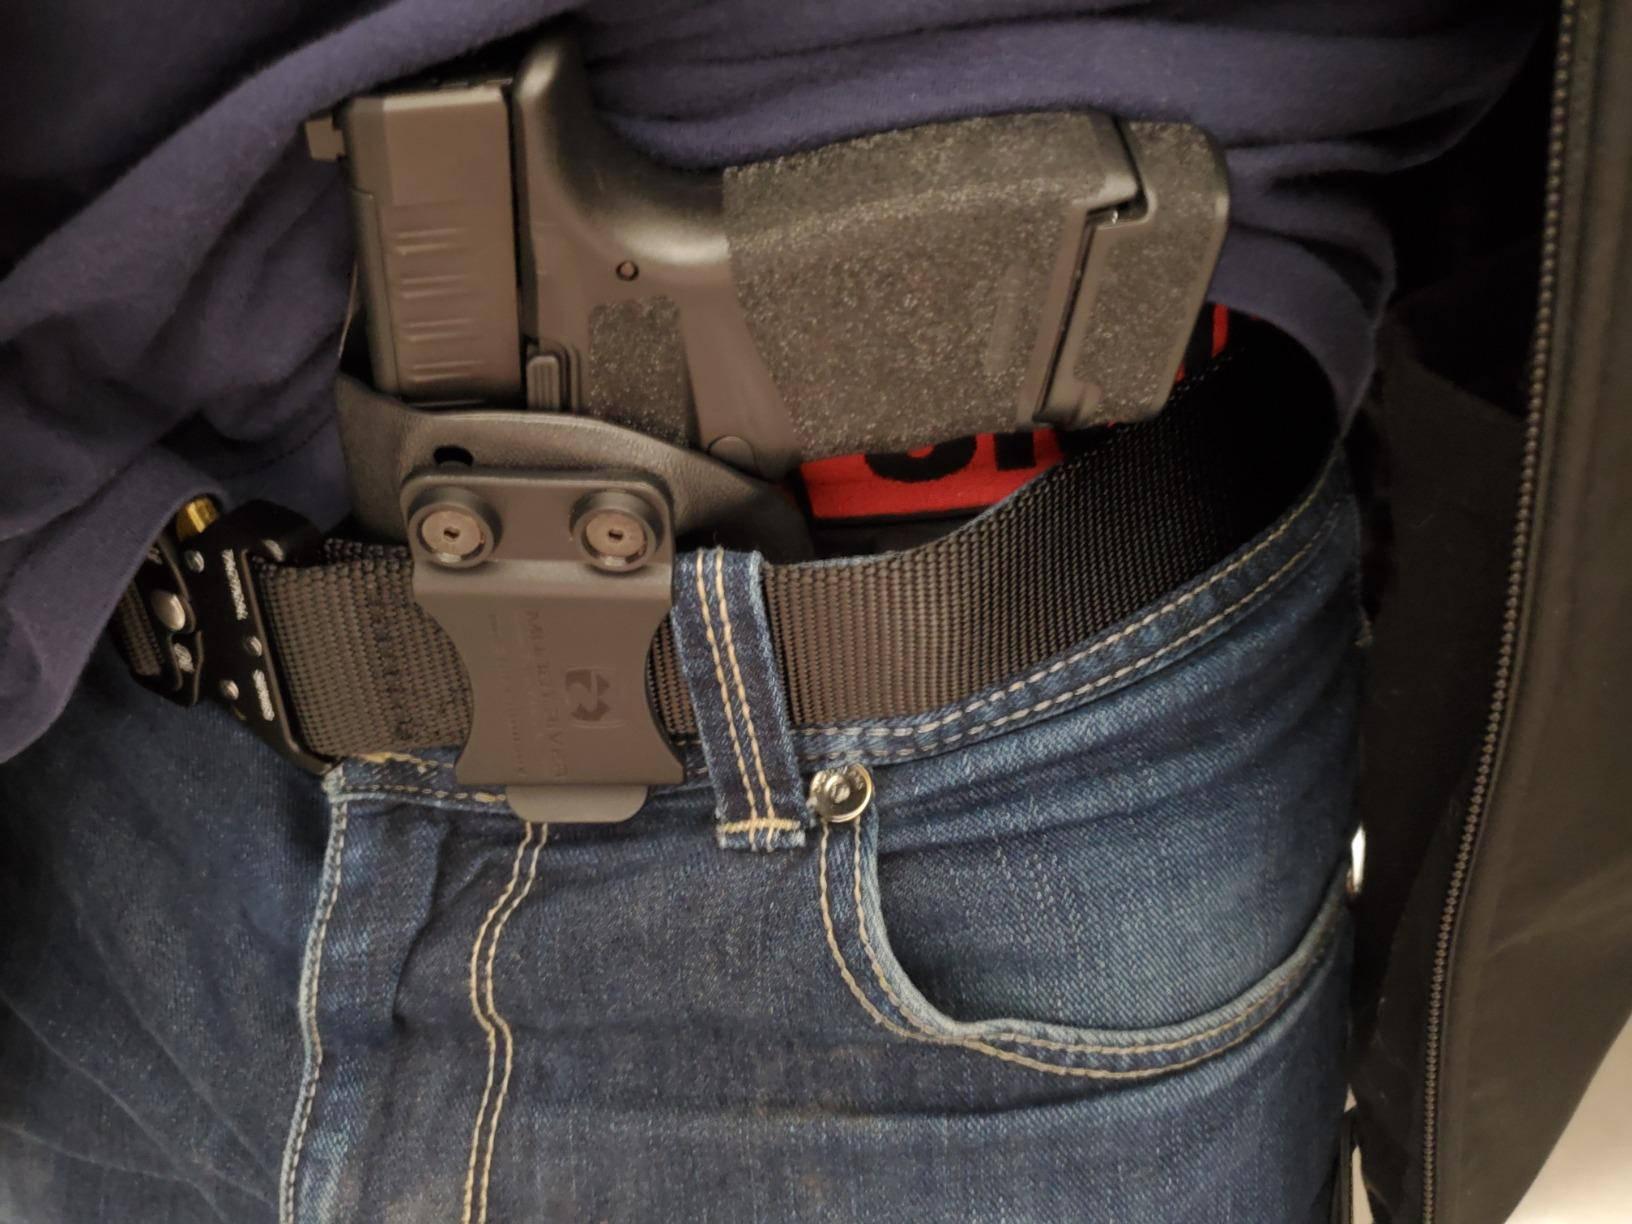 the best tactical belts